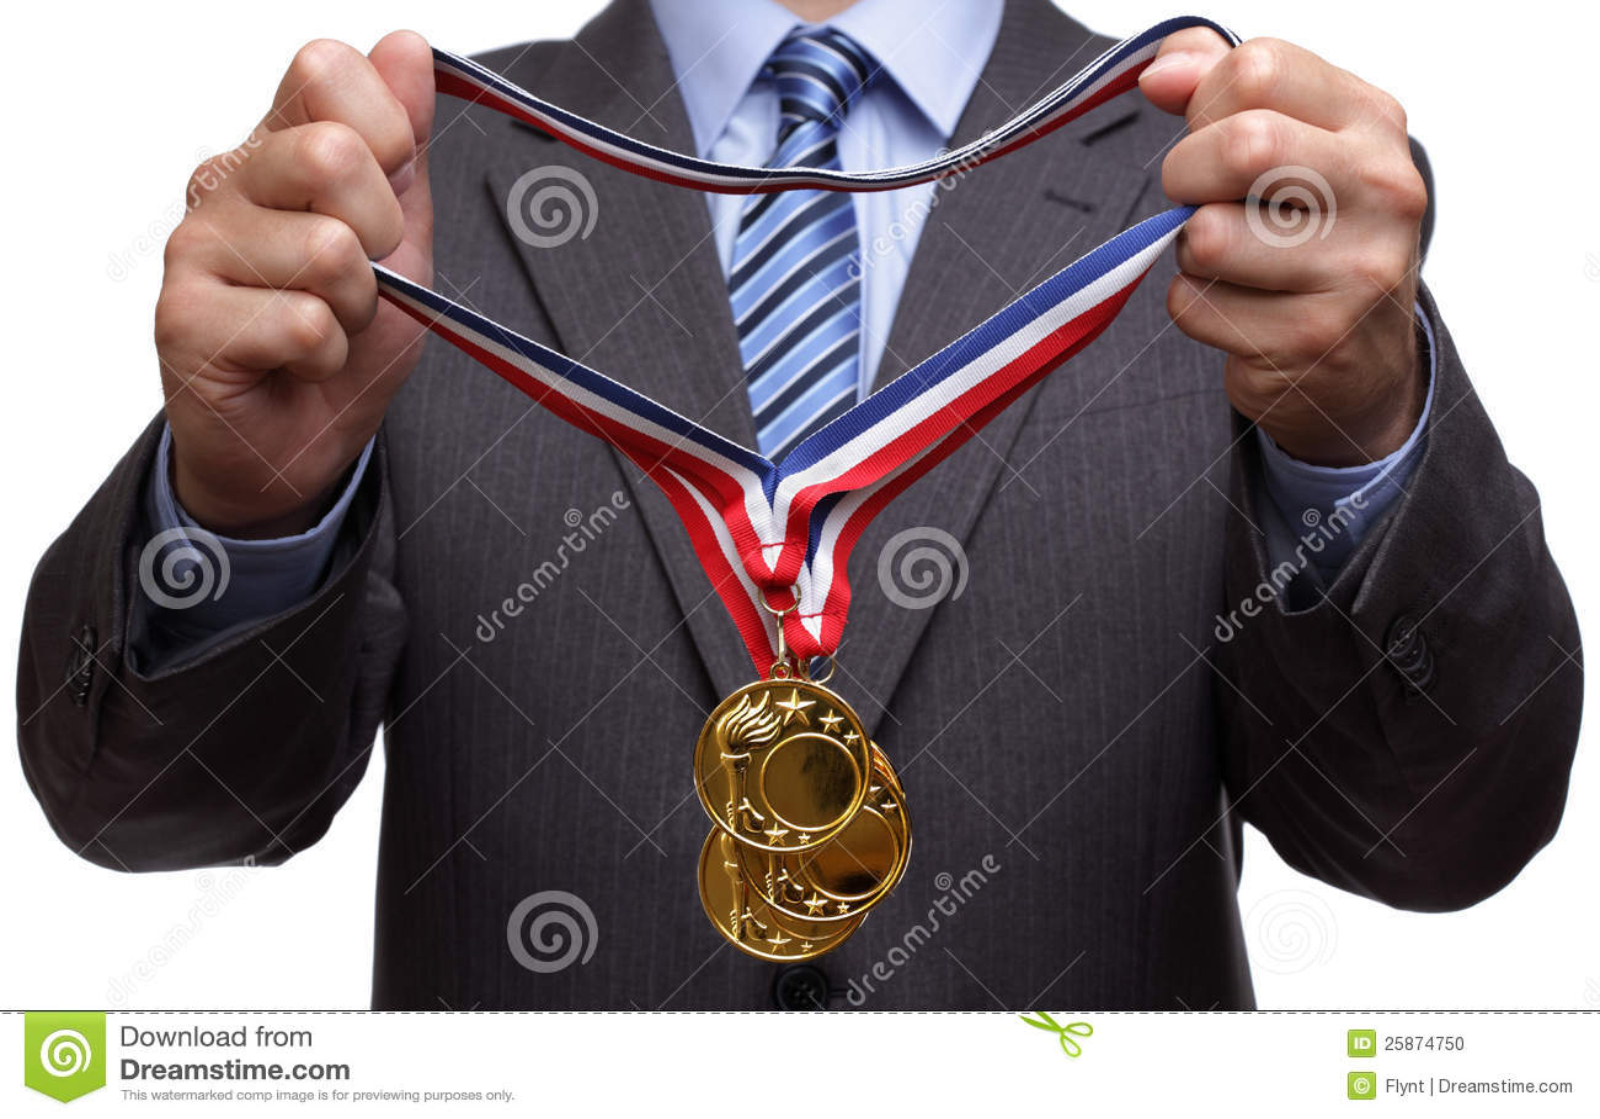 Concedendo a medalha de ouro